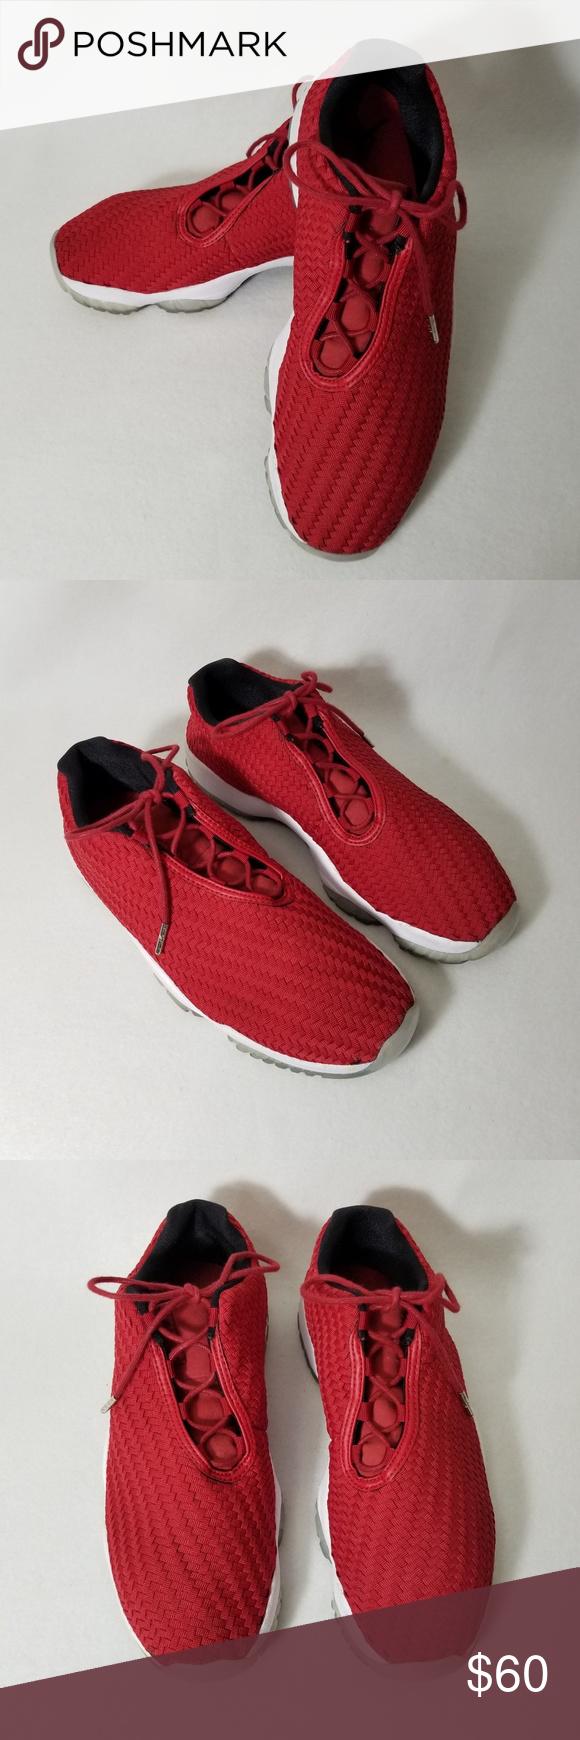 991a44e41694 Nike Air Jordan Future Low Gym Red - Size 9.5 Nike Air Jordan Future Low Gym